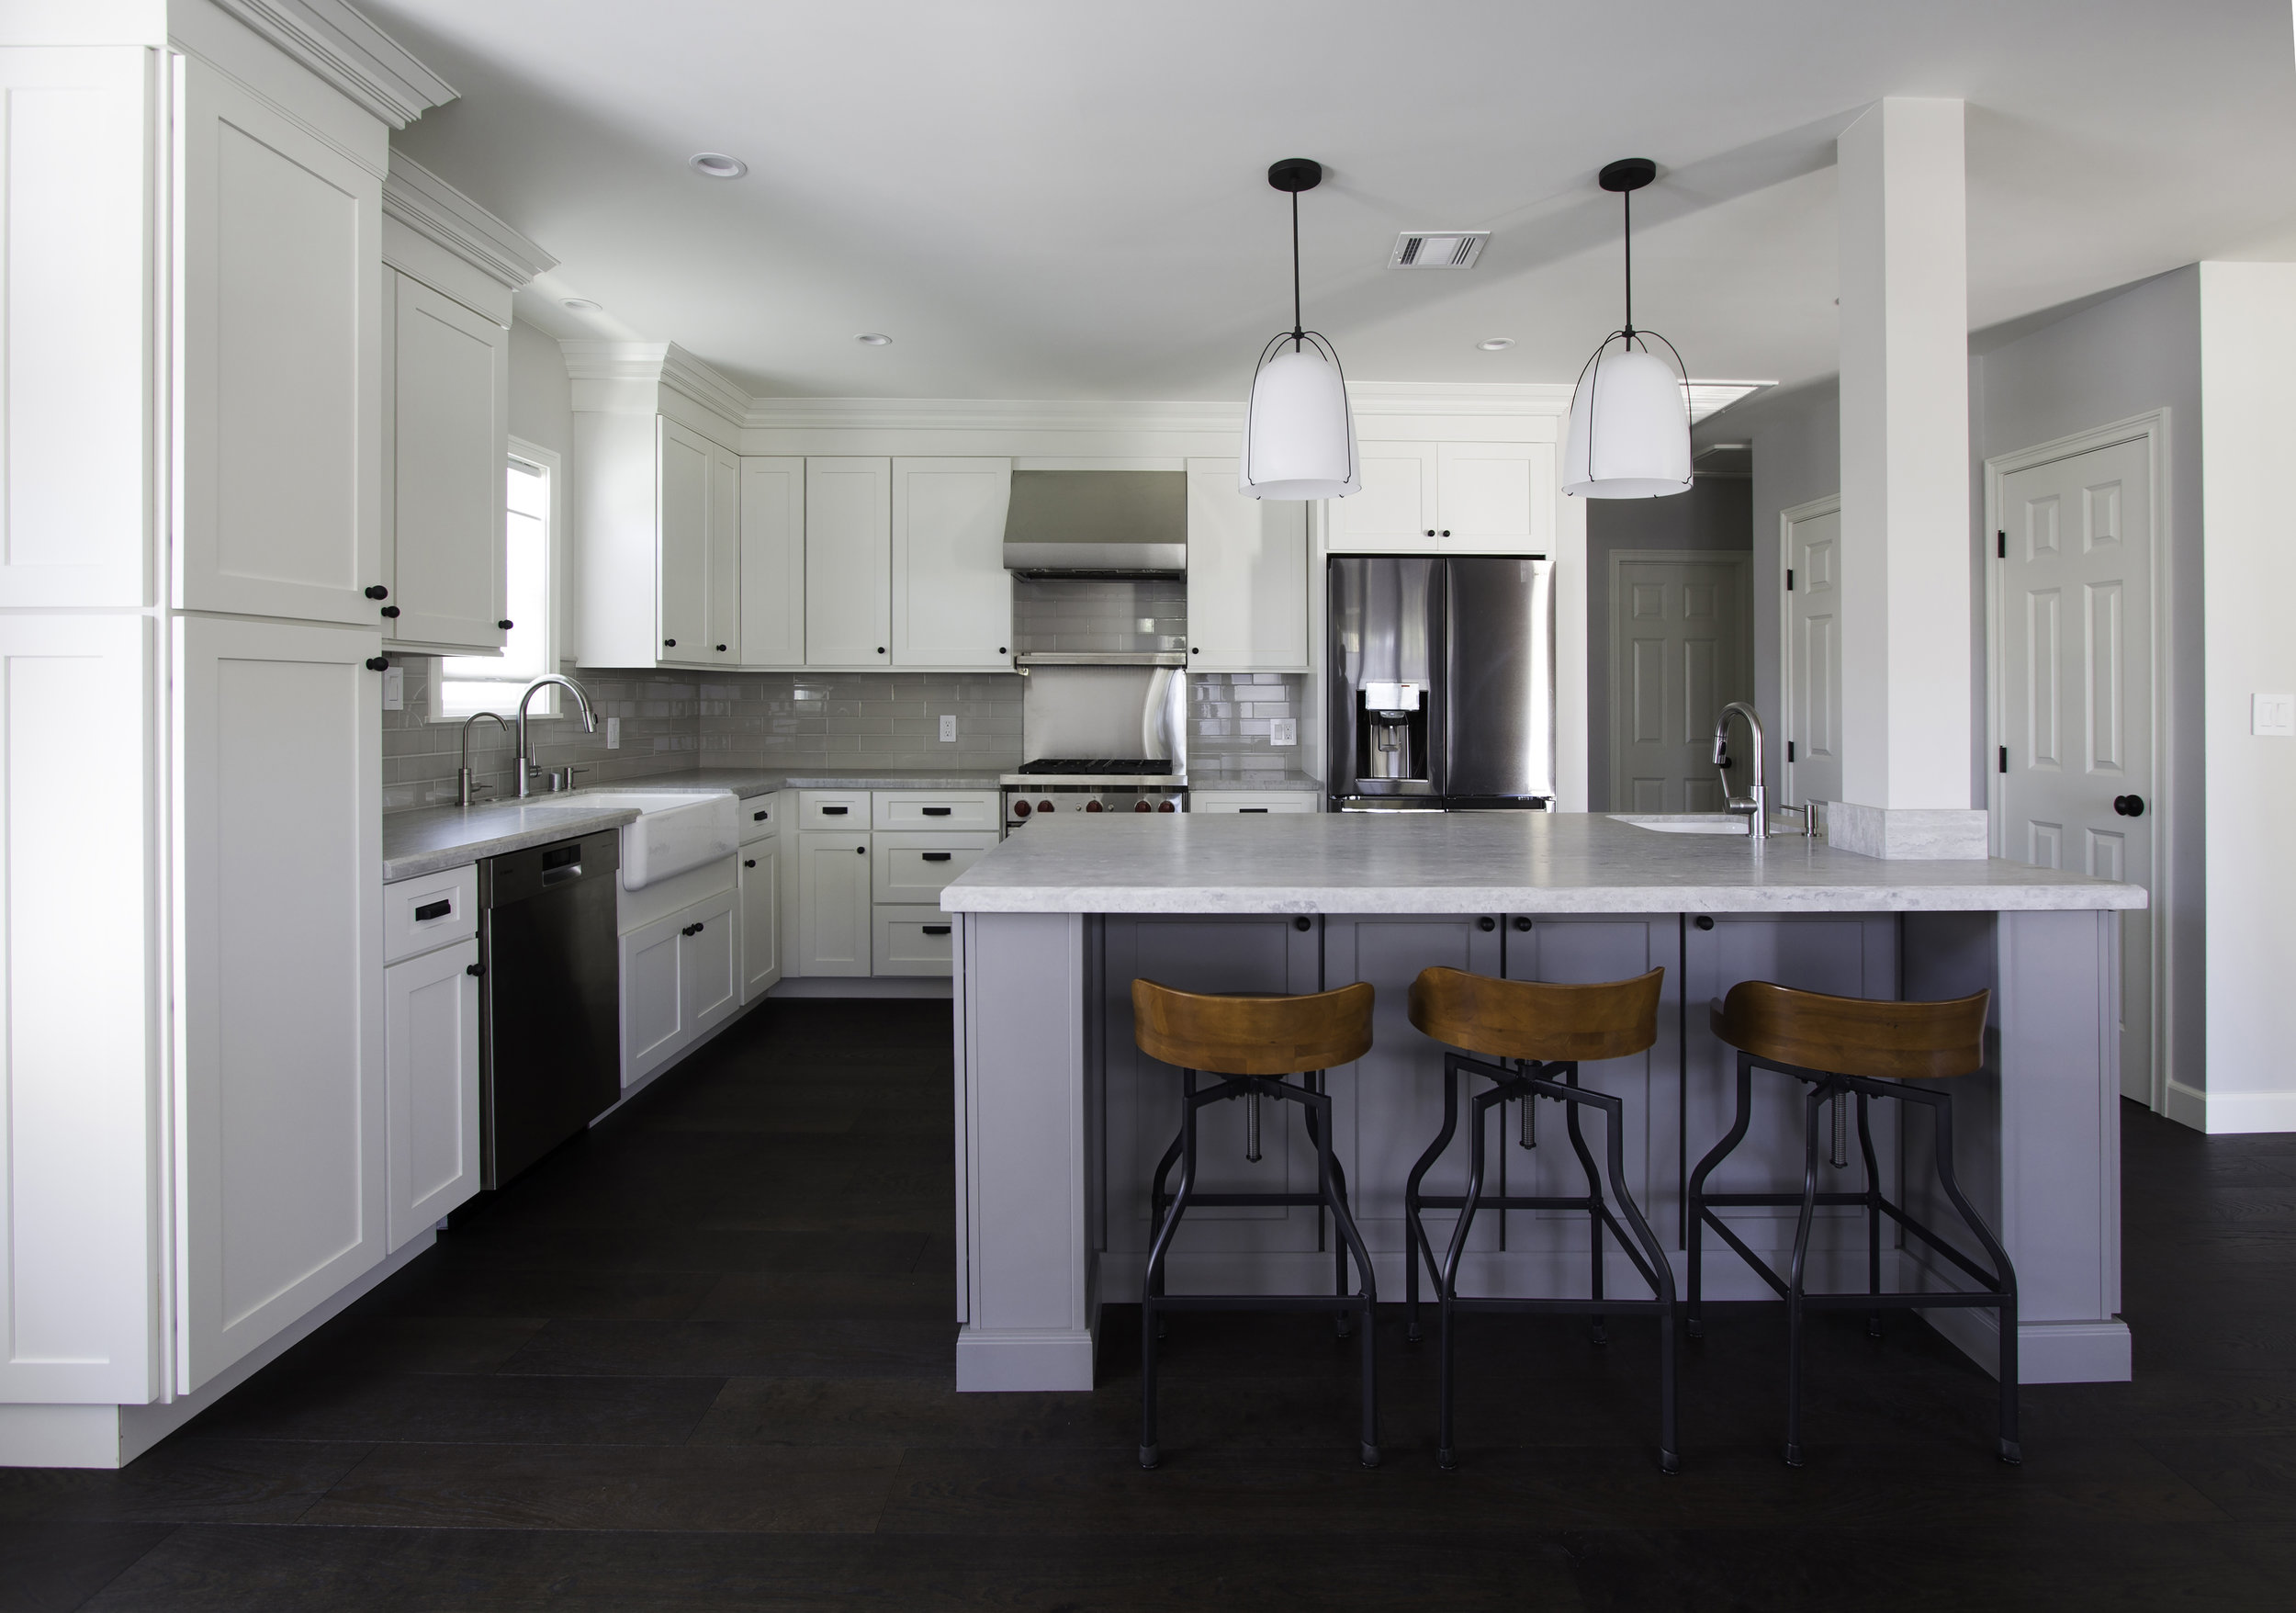 kitchen 2-large.jpg